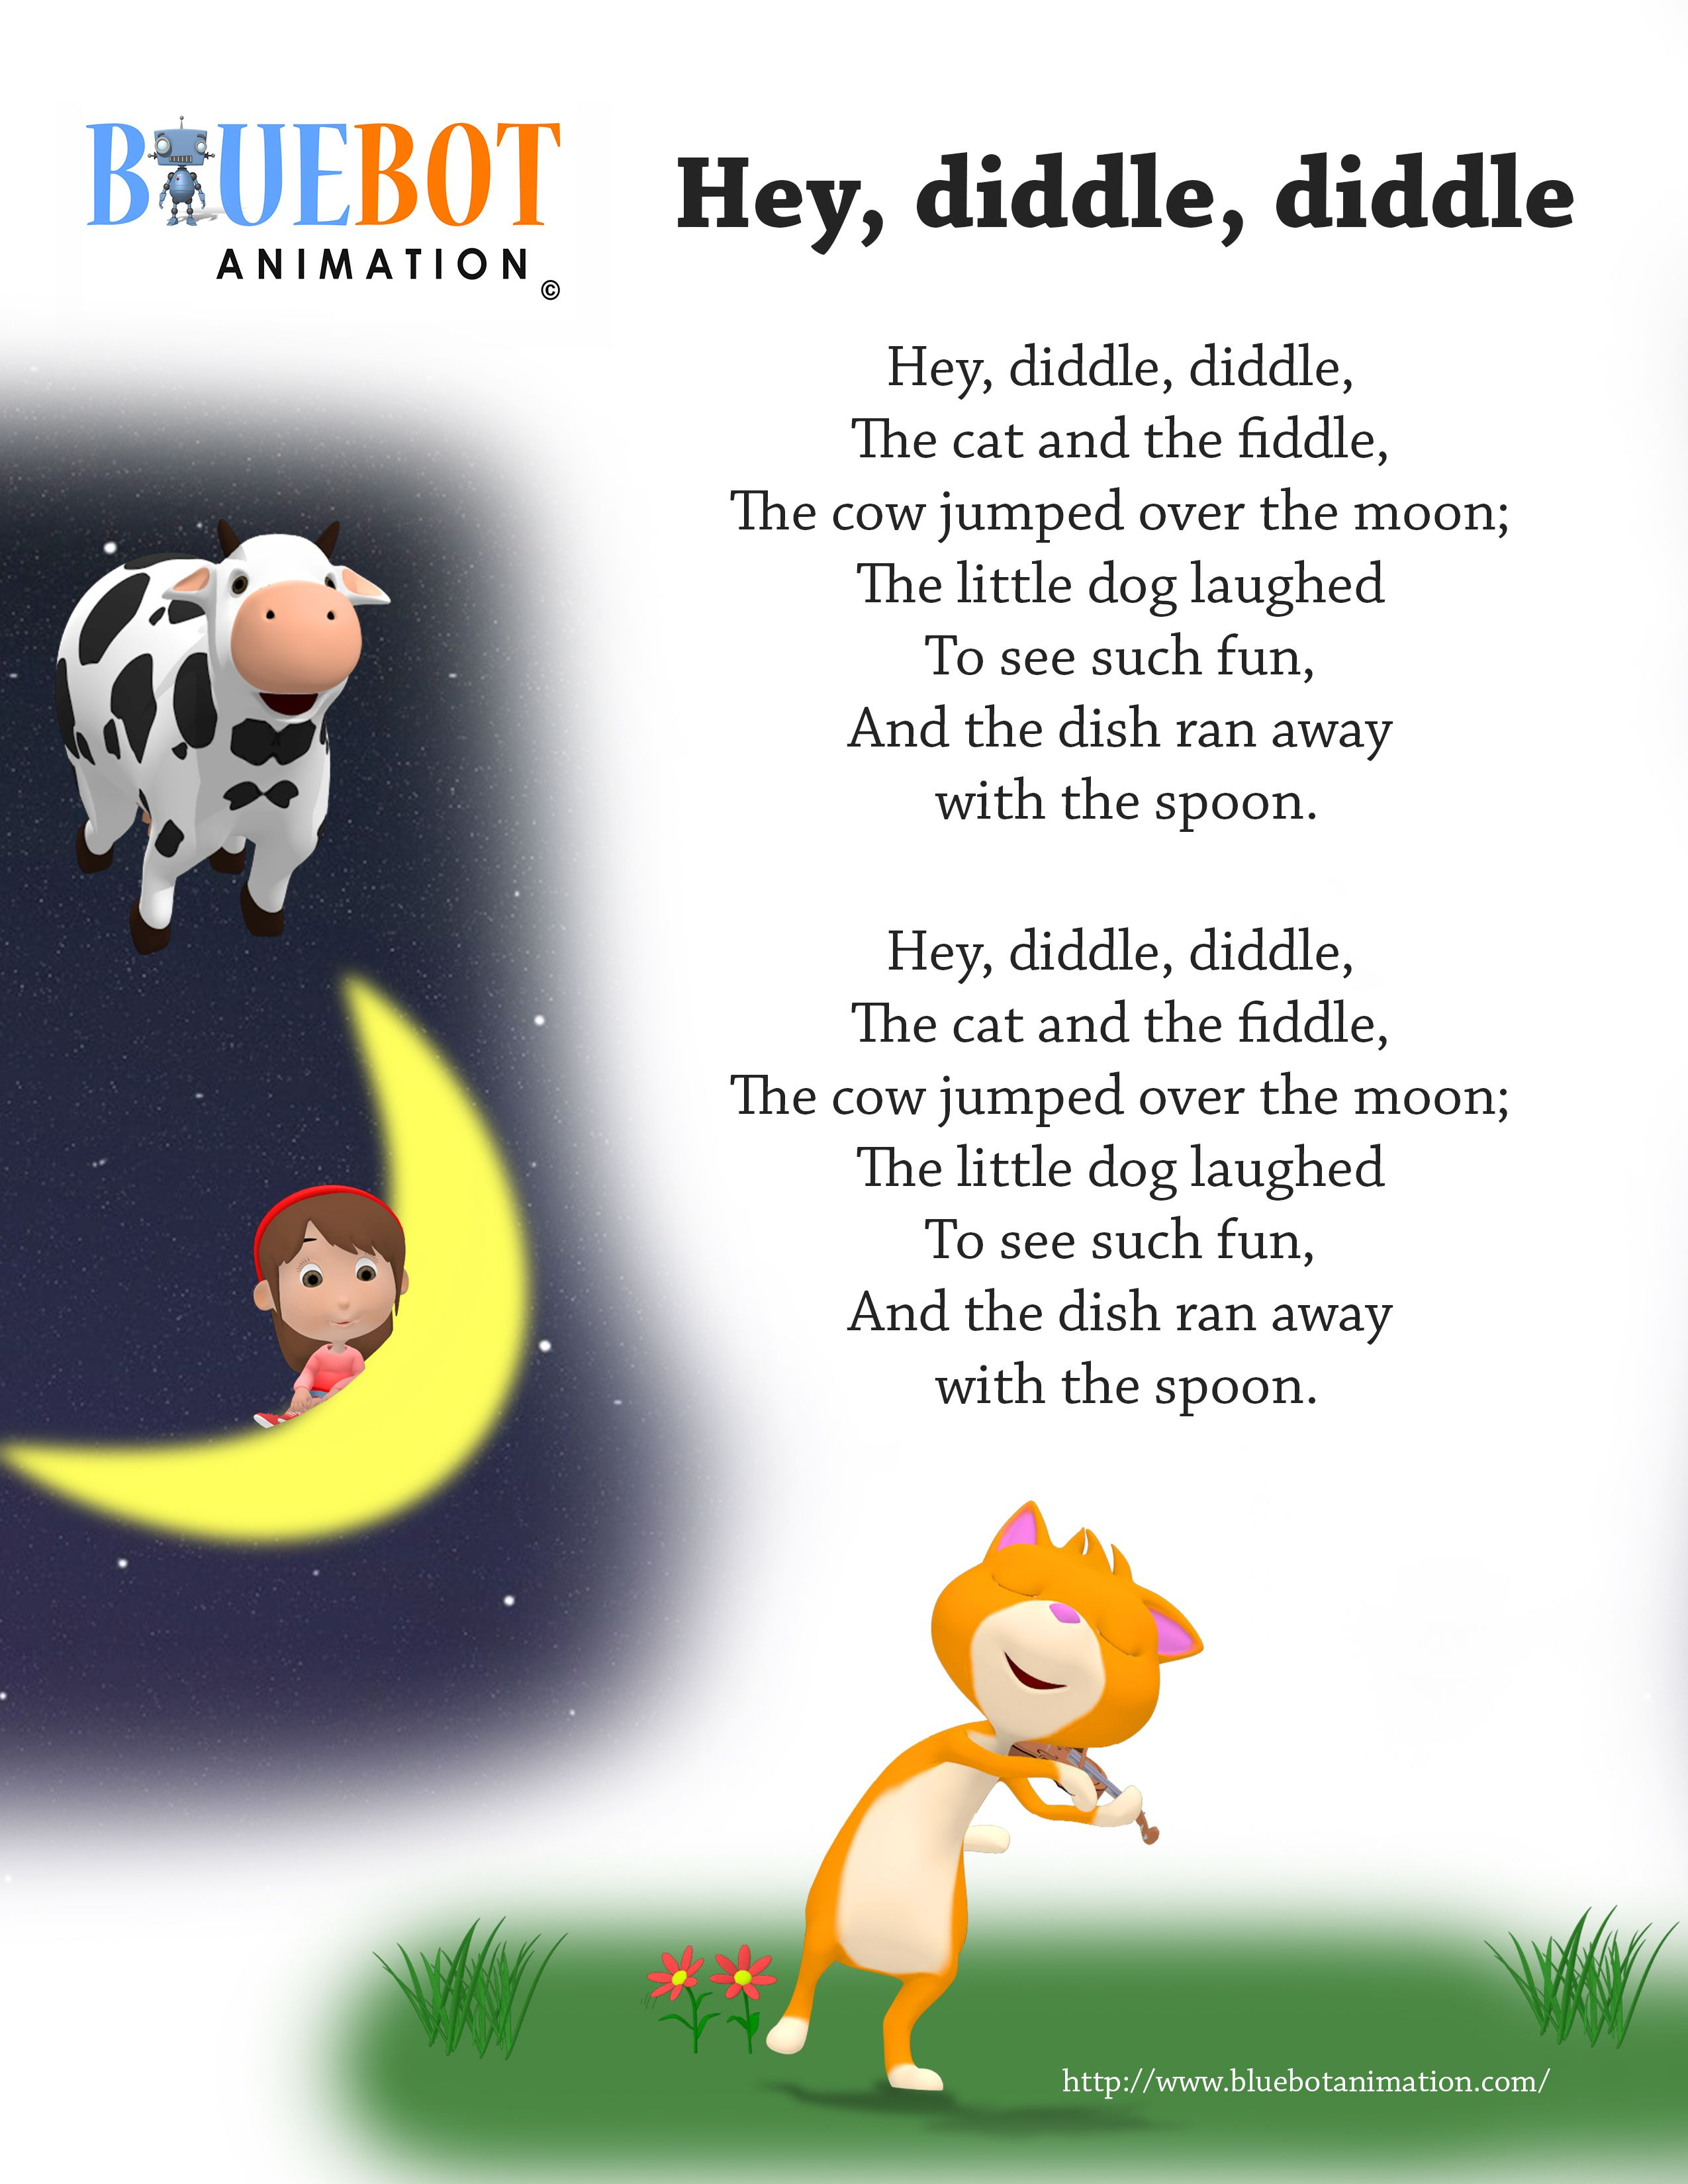 Free printable nursery rhyme lyrics page. , Hey diddle